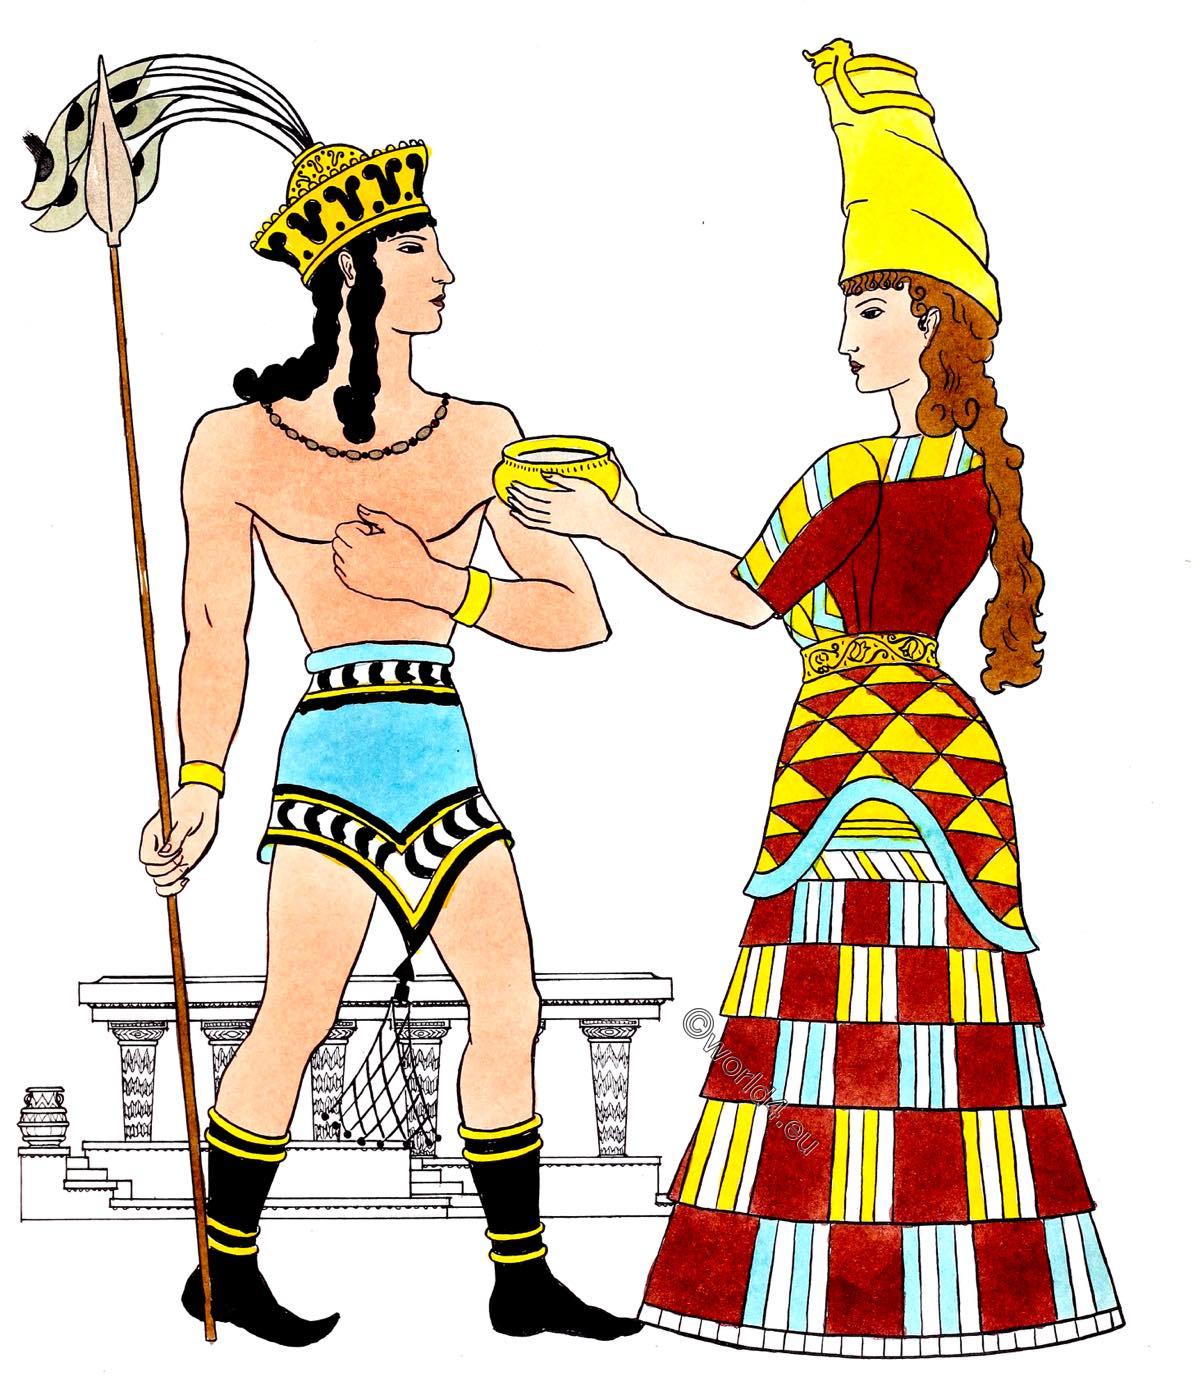 ancient, Cretan, costume, Mycenaean, Minoan, fashion, history